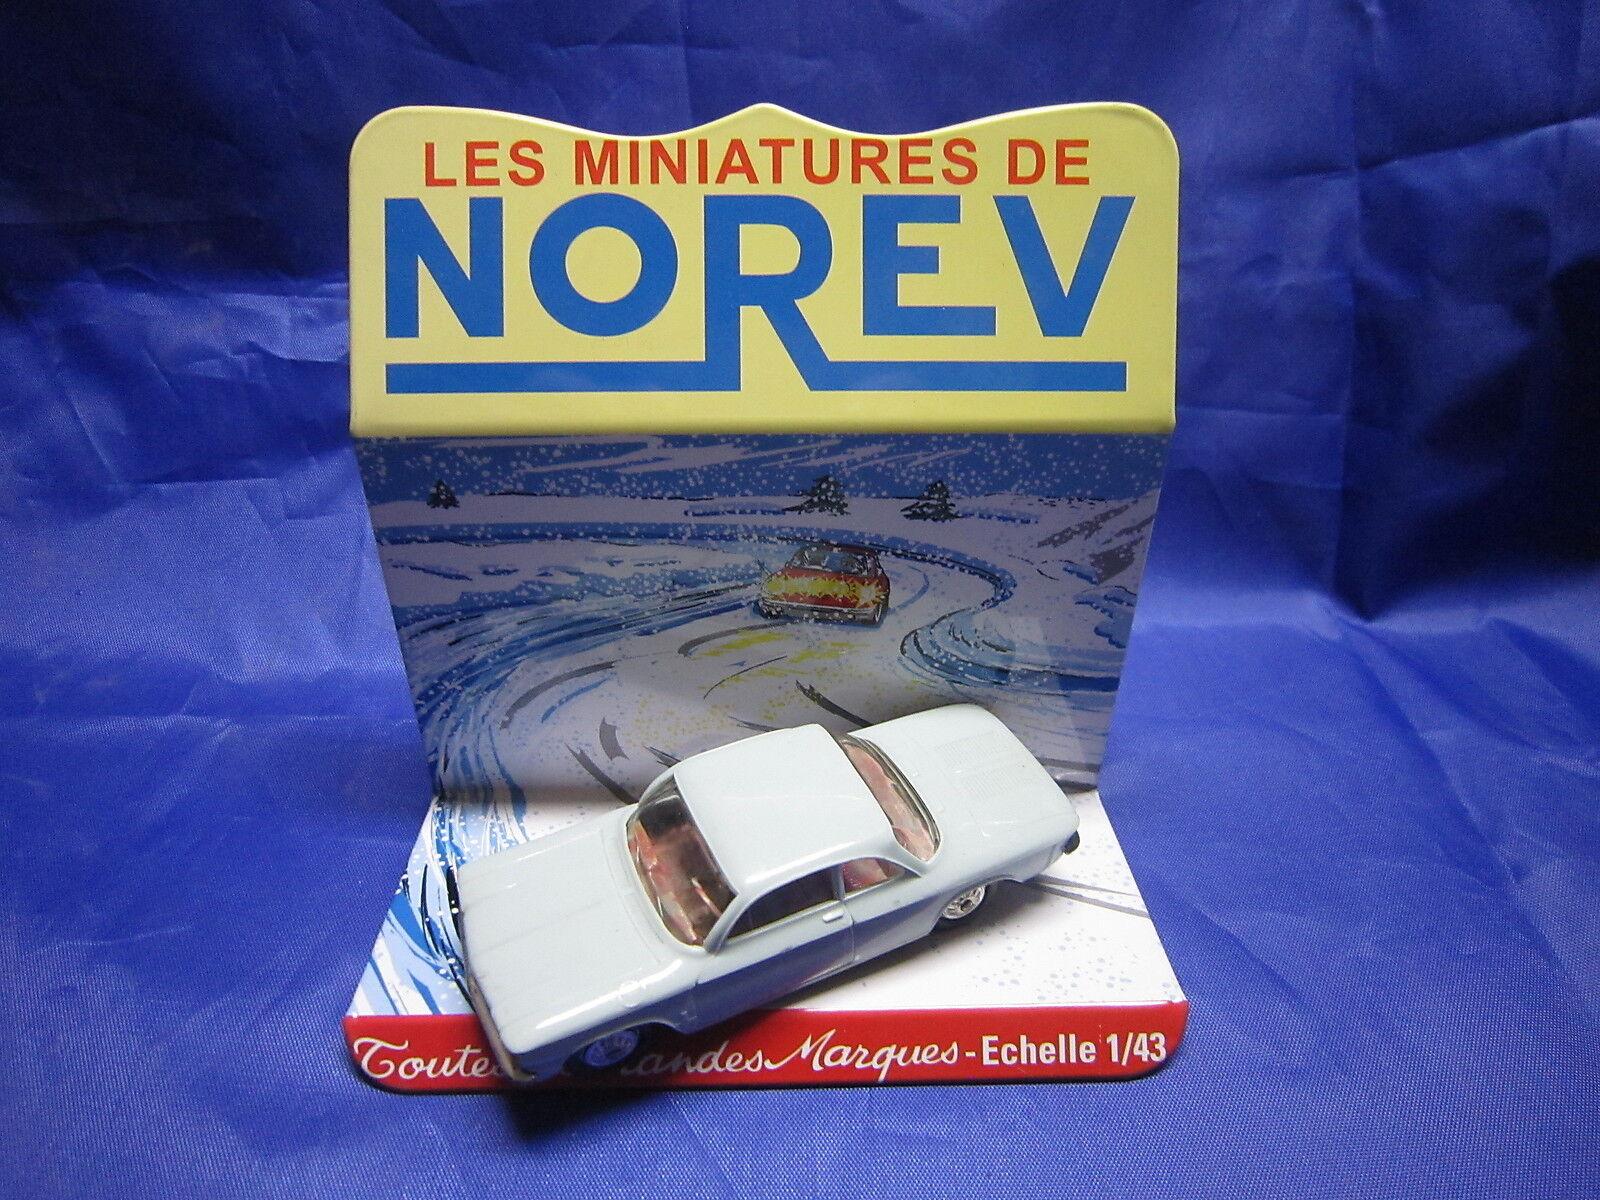 Dv6269 chevrolet corvair monza coupé norev plastiksprengstoff blwu blass ref 1   43 der